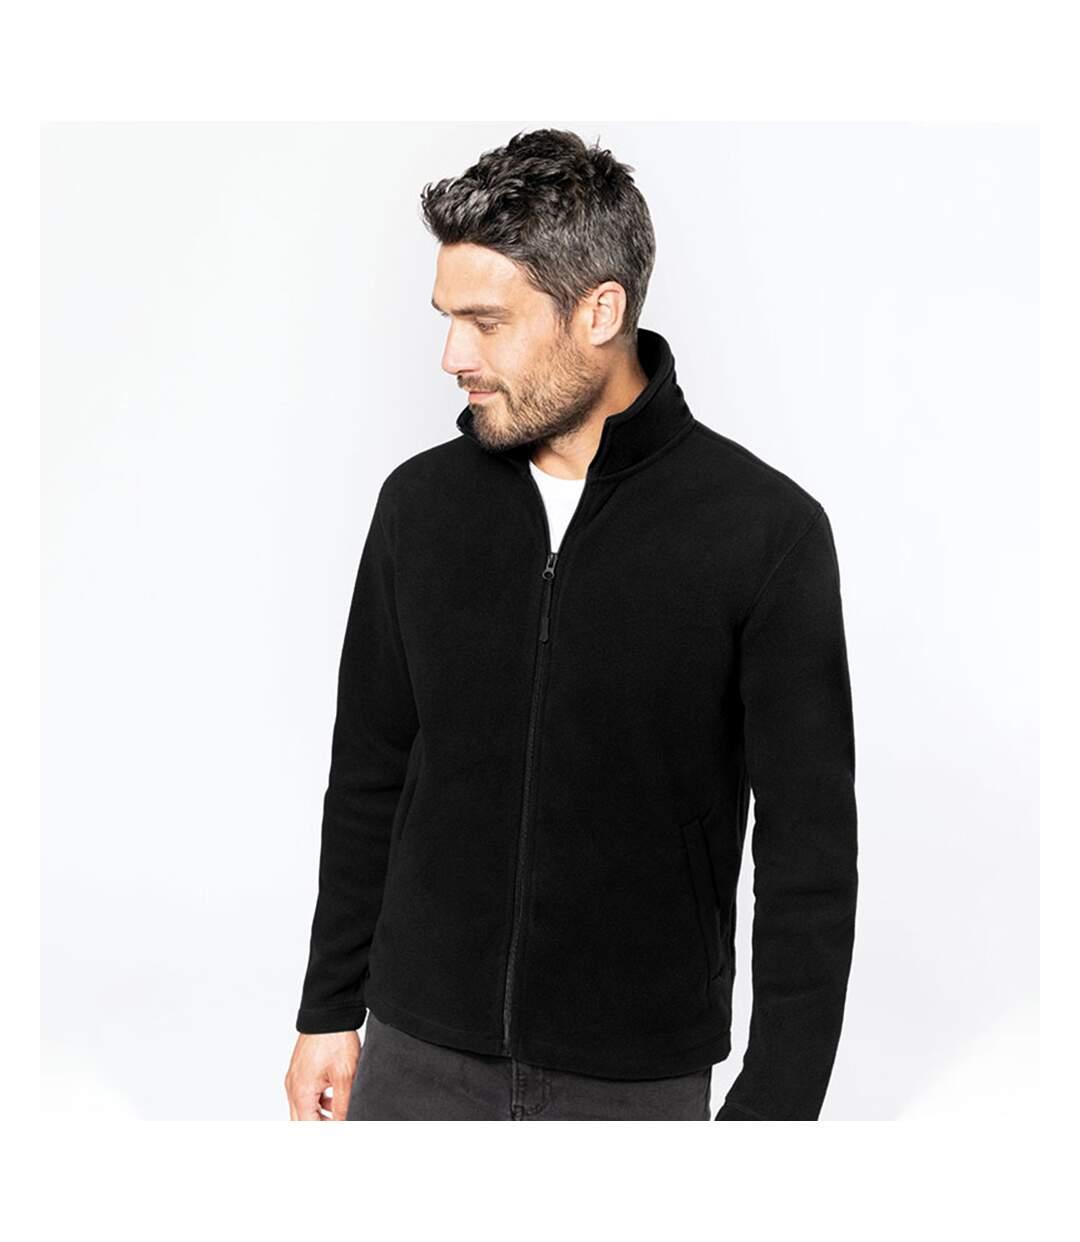 Kariban Mens Full Zip Anti Pill Microfleece Jacket (Black) - UTRW4222